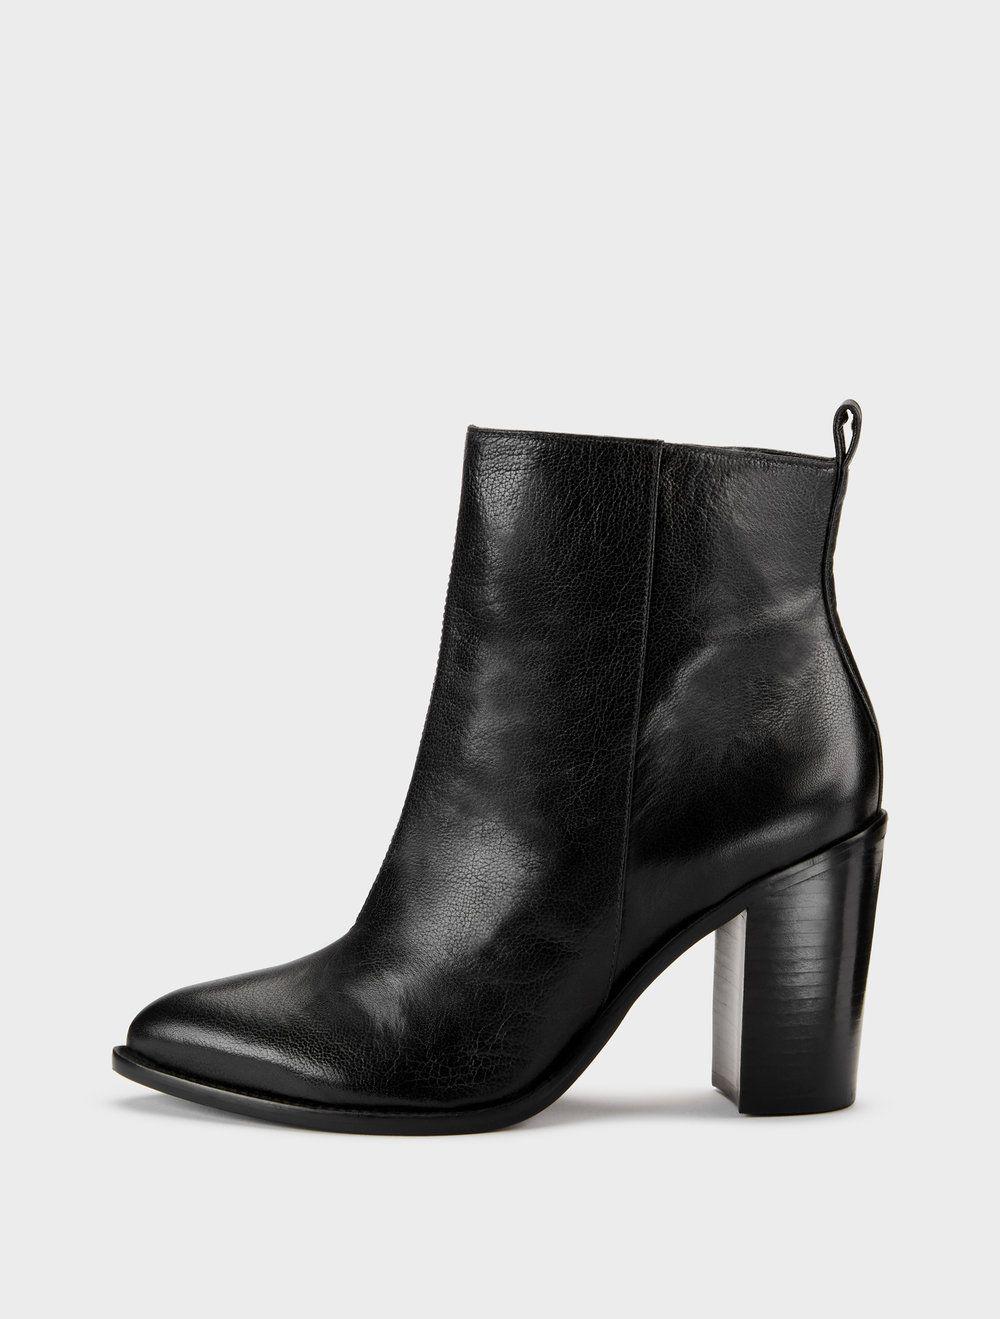 Houston Glazed Leather Ankle Boot